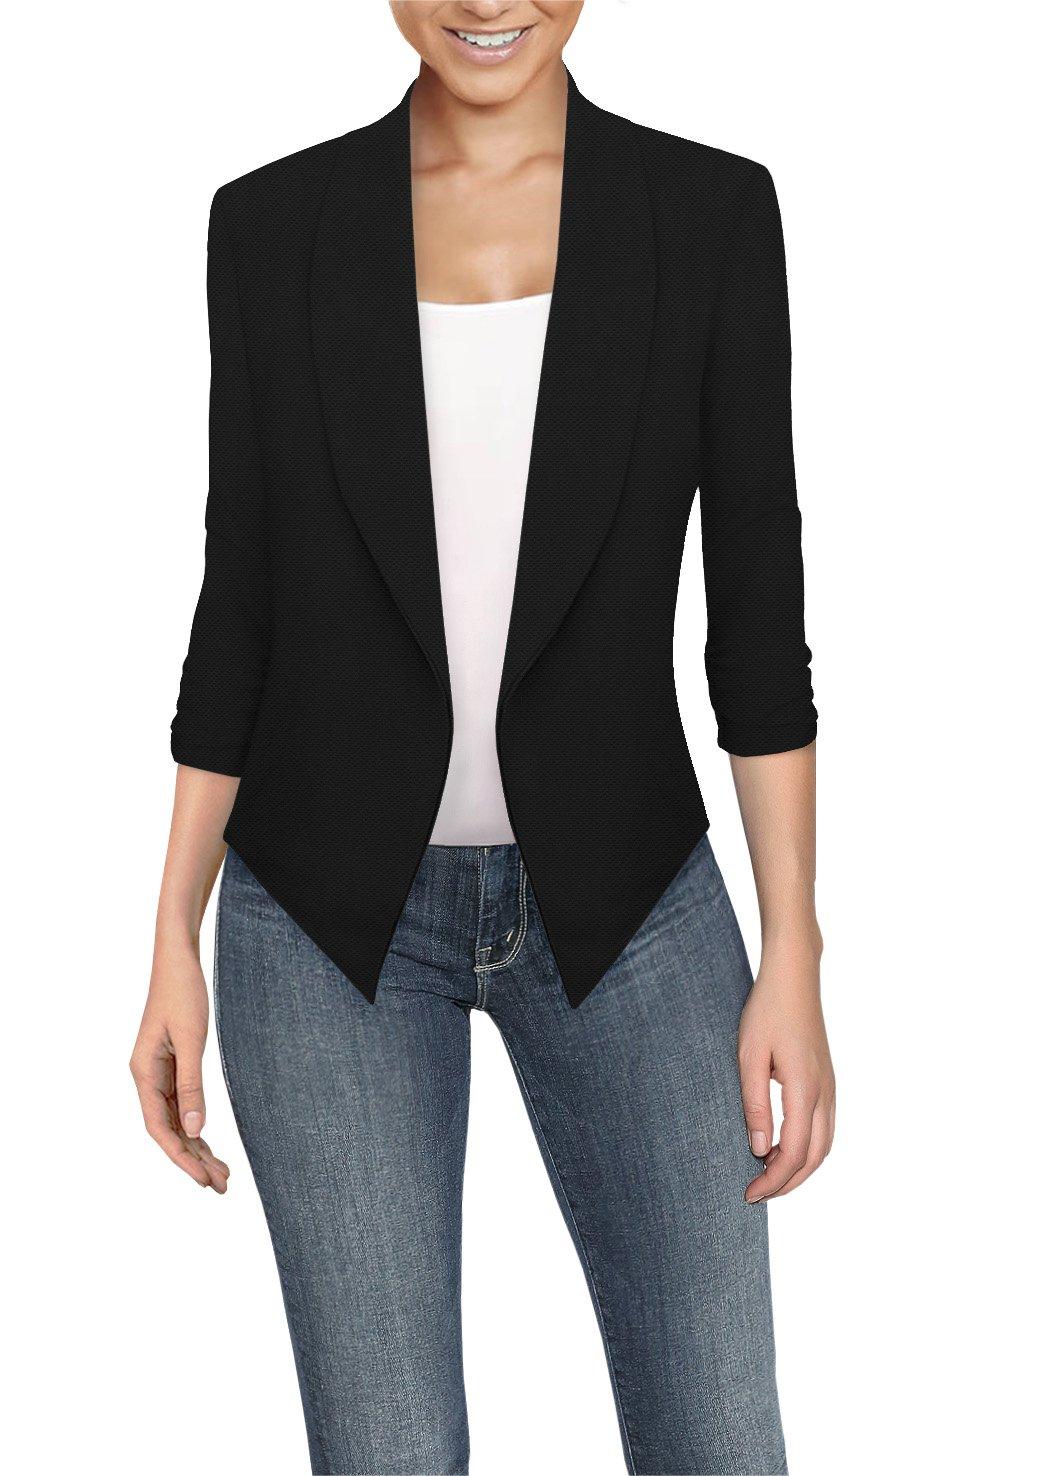 HyBrid & Company Womens Casual Work Office Open Front Blazer JK1133 E3500 Black M by HyBrid & Company (Image #1)